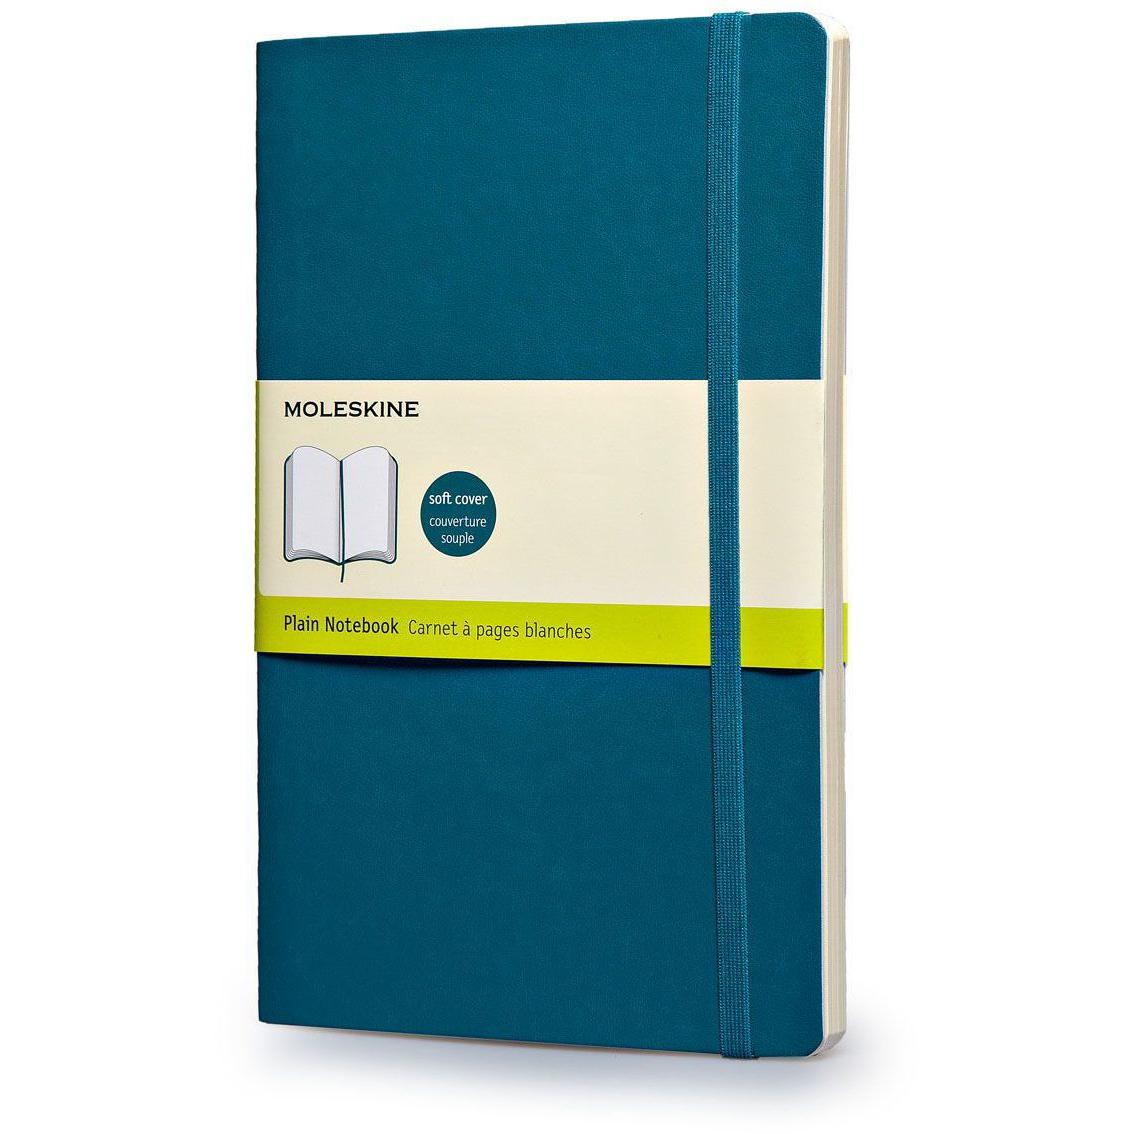 Moleskine Plain Soft Cover Notebook Large (ME-QP618B6) - Underwater Blue (pc)